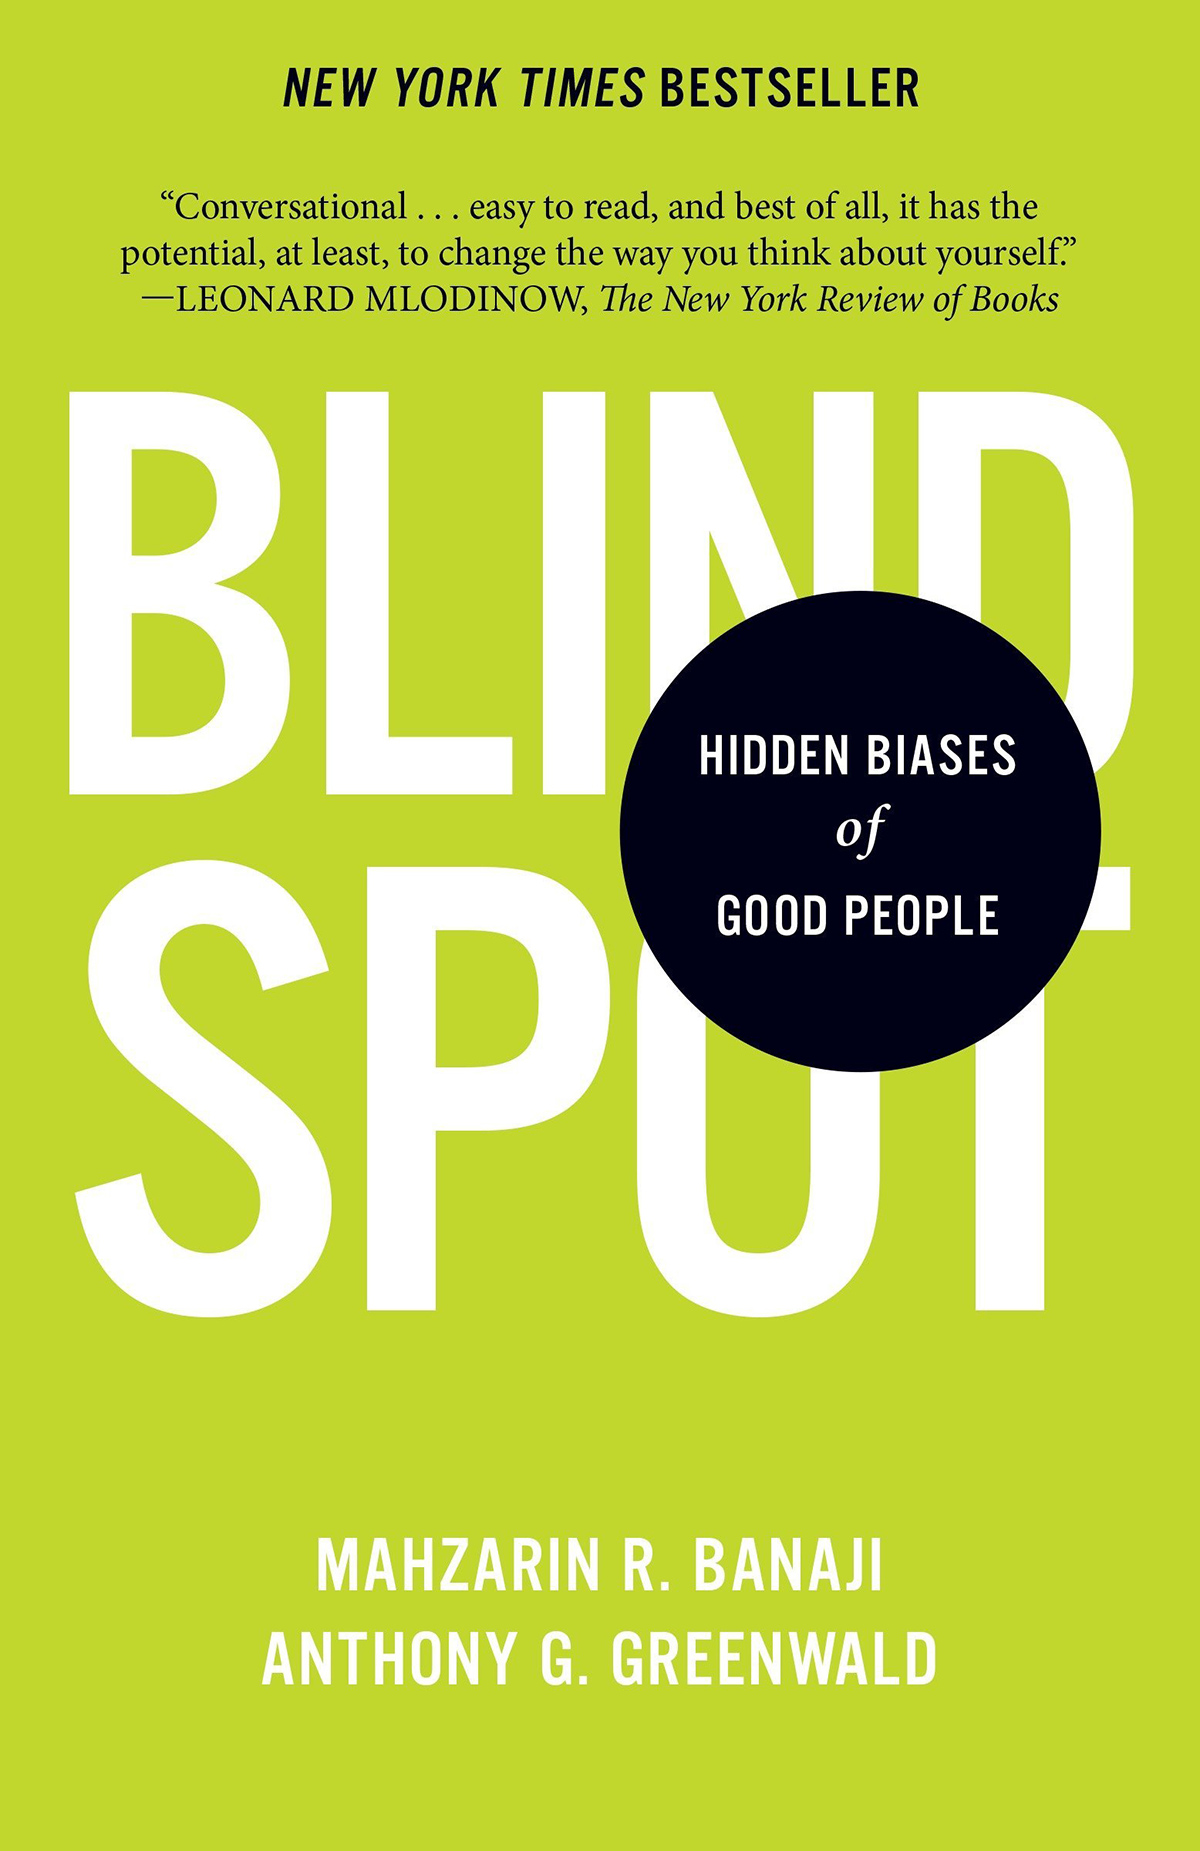 Blindspot: Hidden Biases of Good People by Mahzarin Banaji and Anthony Greenwald